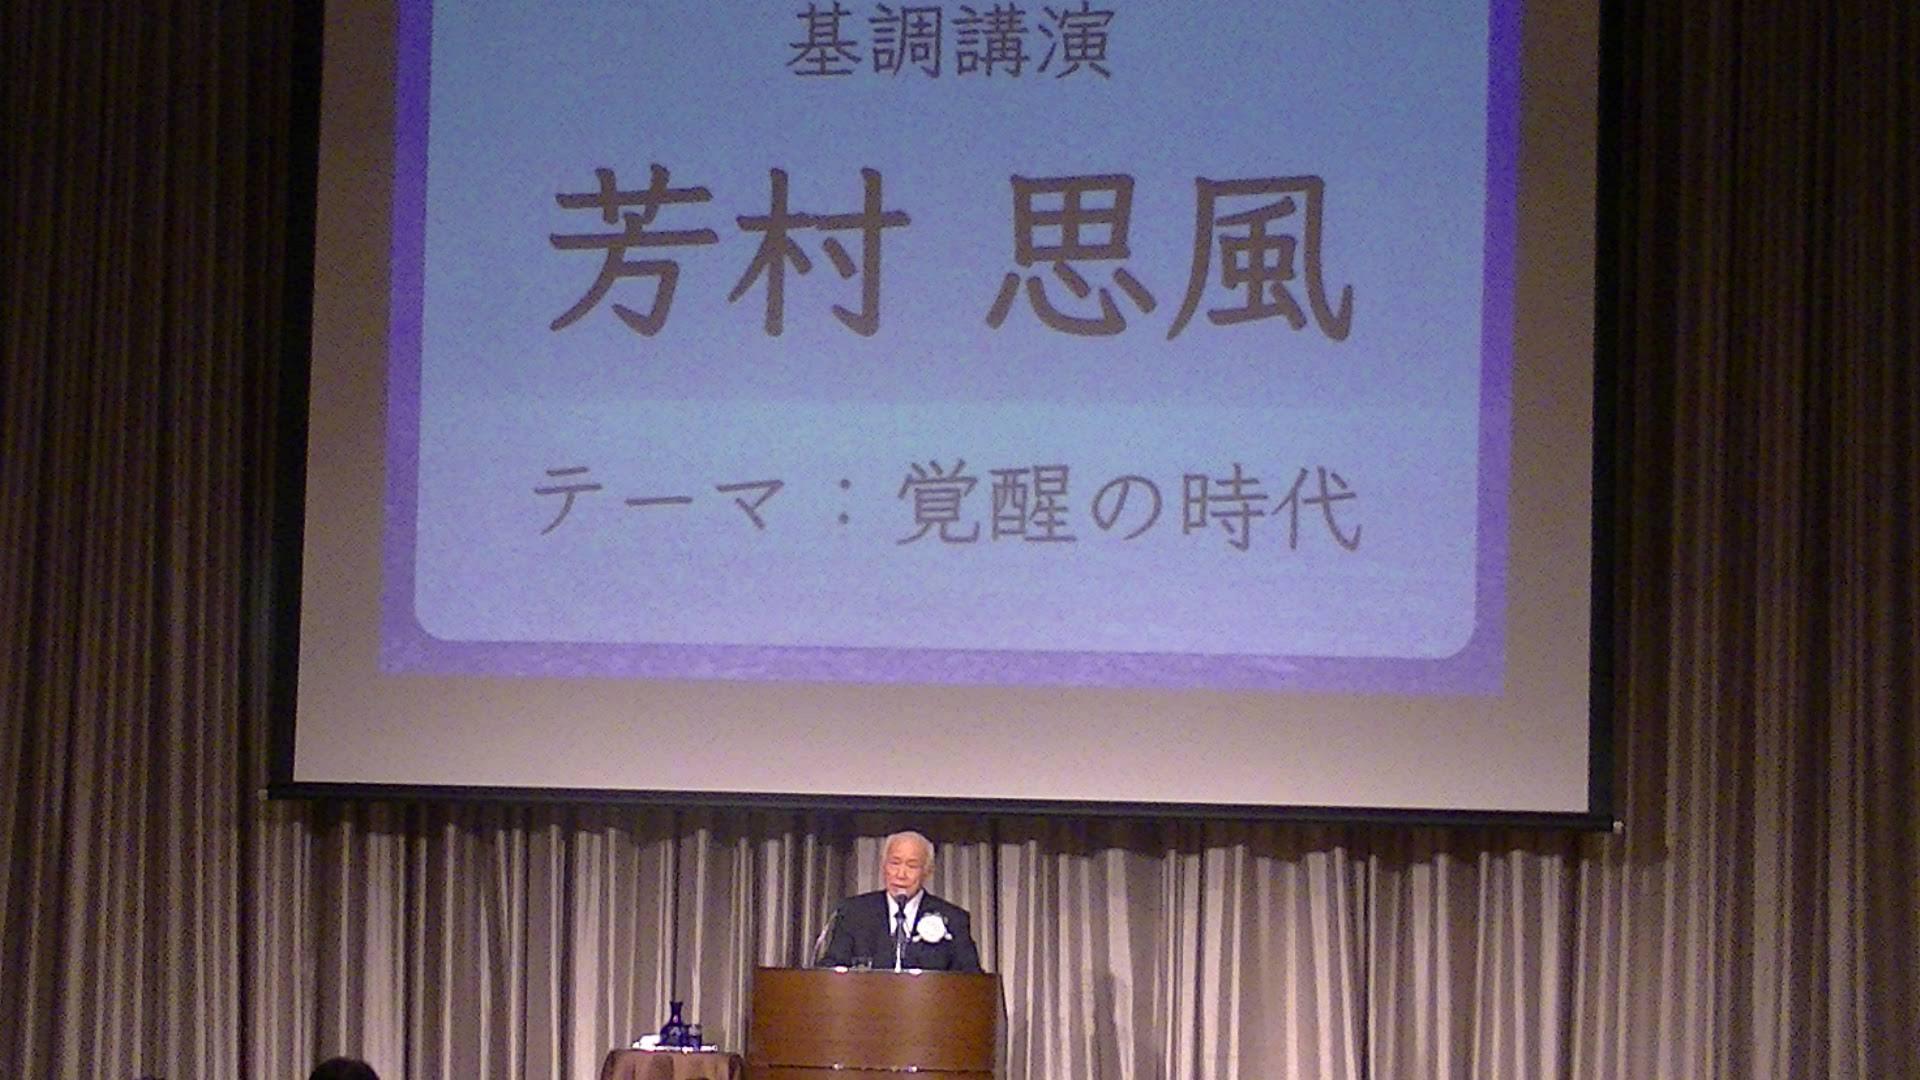 PIC 1638 1 - 思風会全国大会in広島